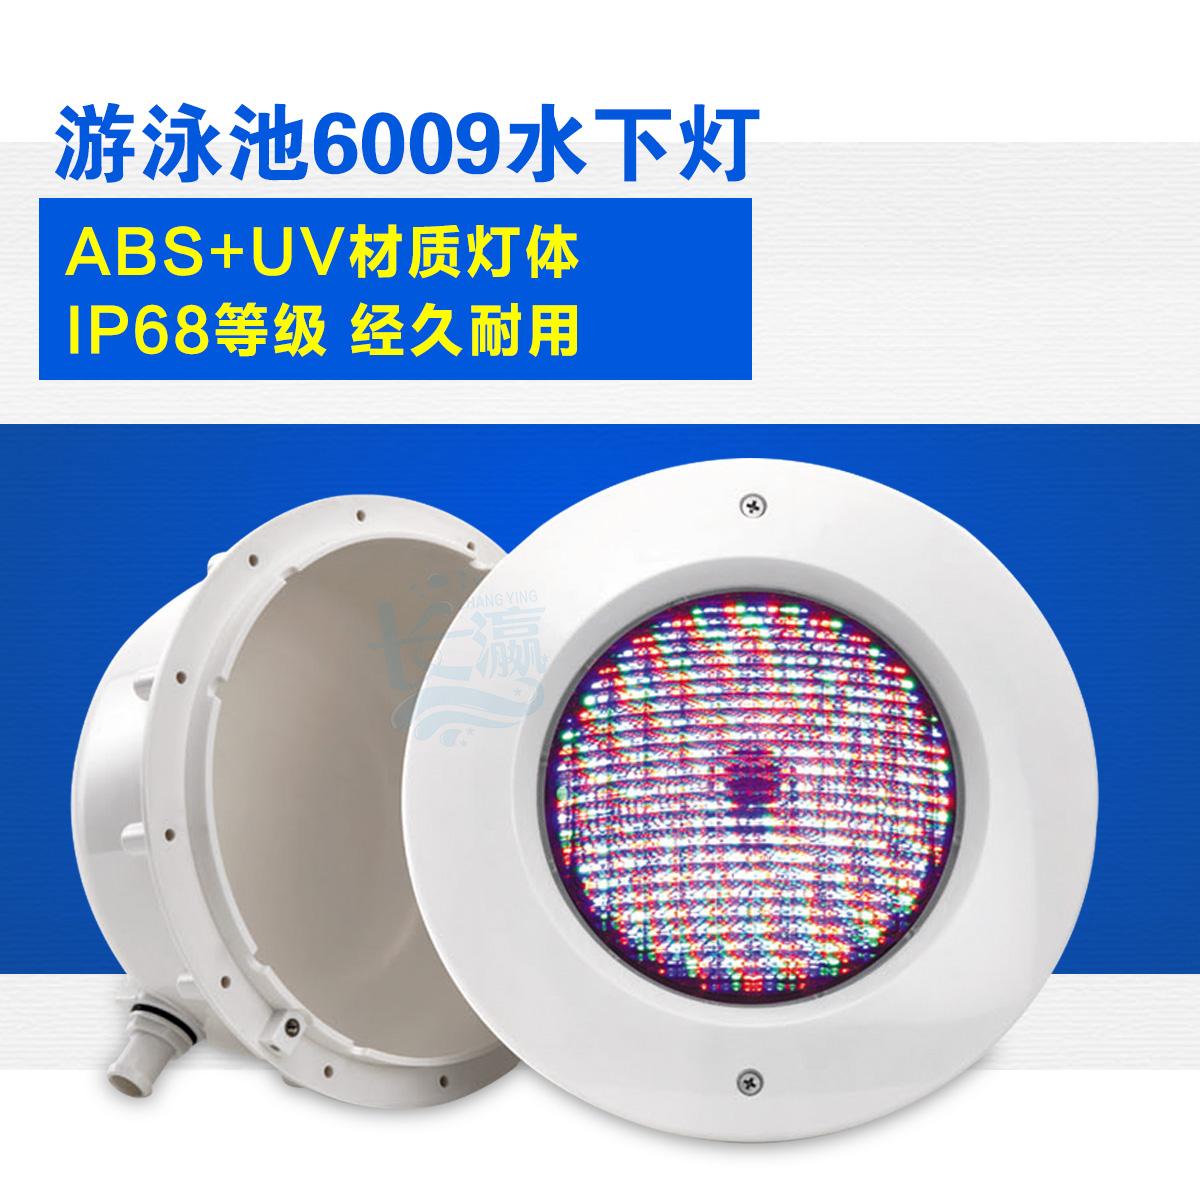 Buy Abs plastic swimming pool underwater lights embedded ...